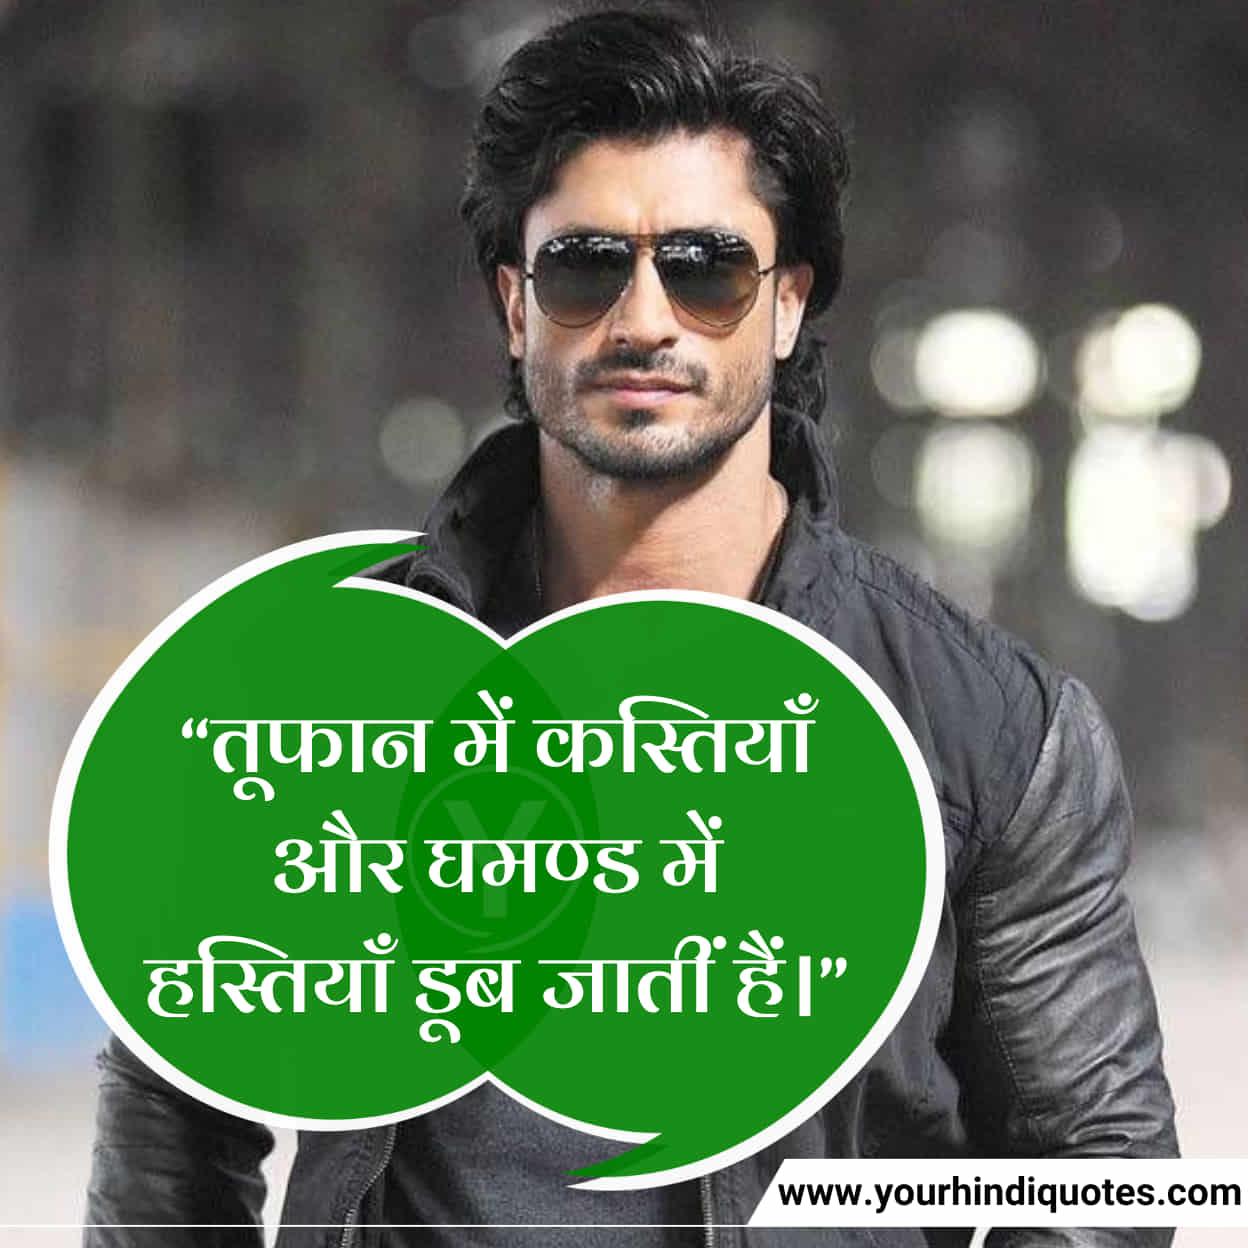 Hindi Motivational Status for Students